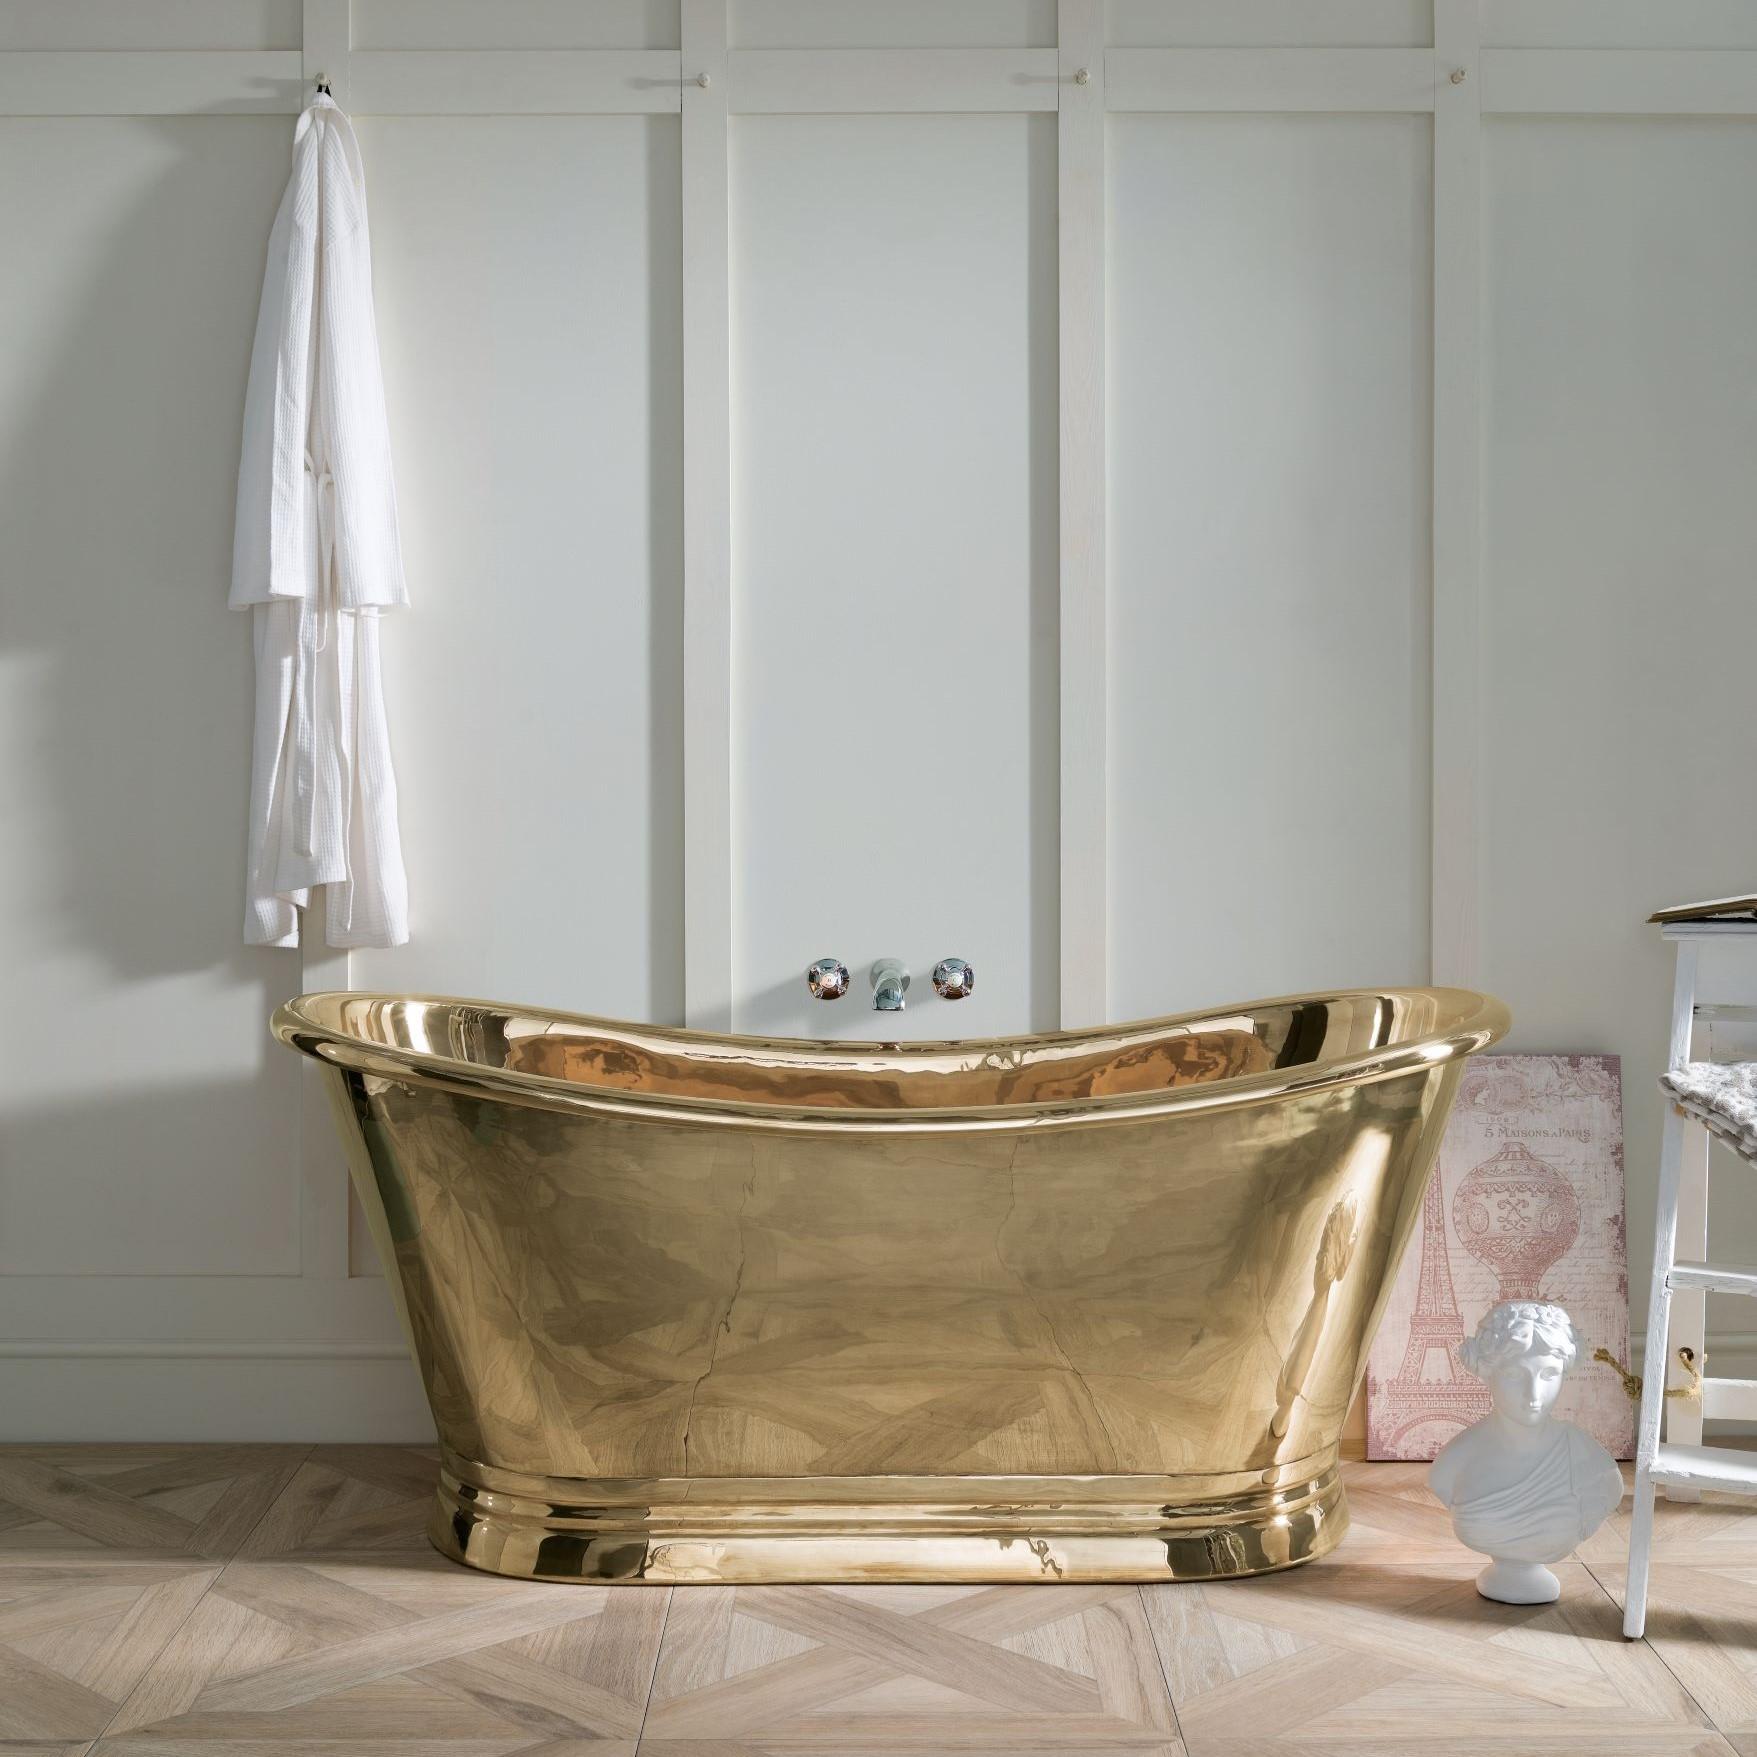 Brass Boat Bath